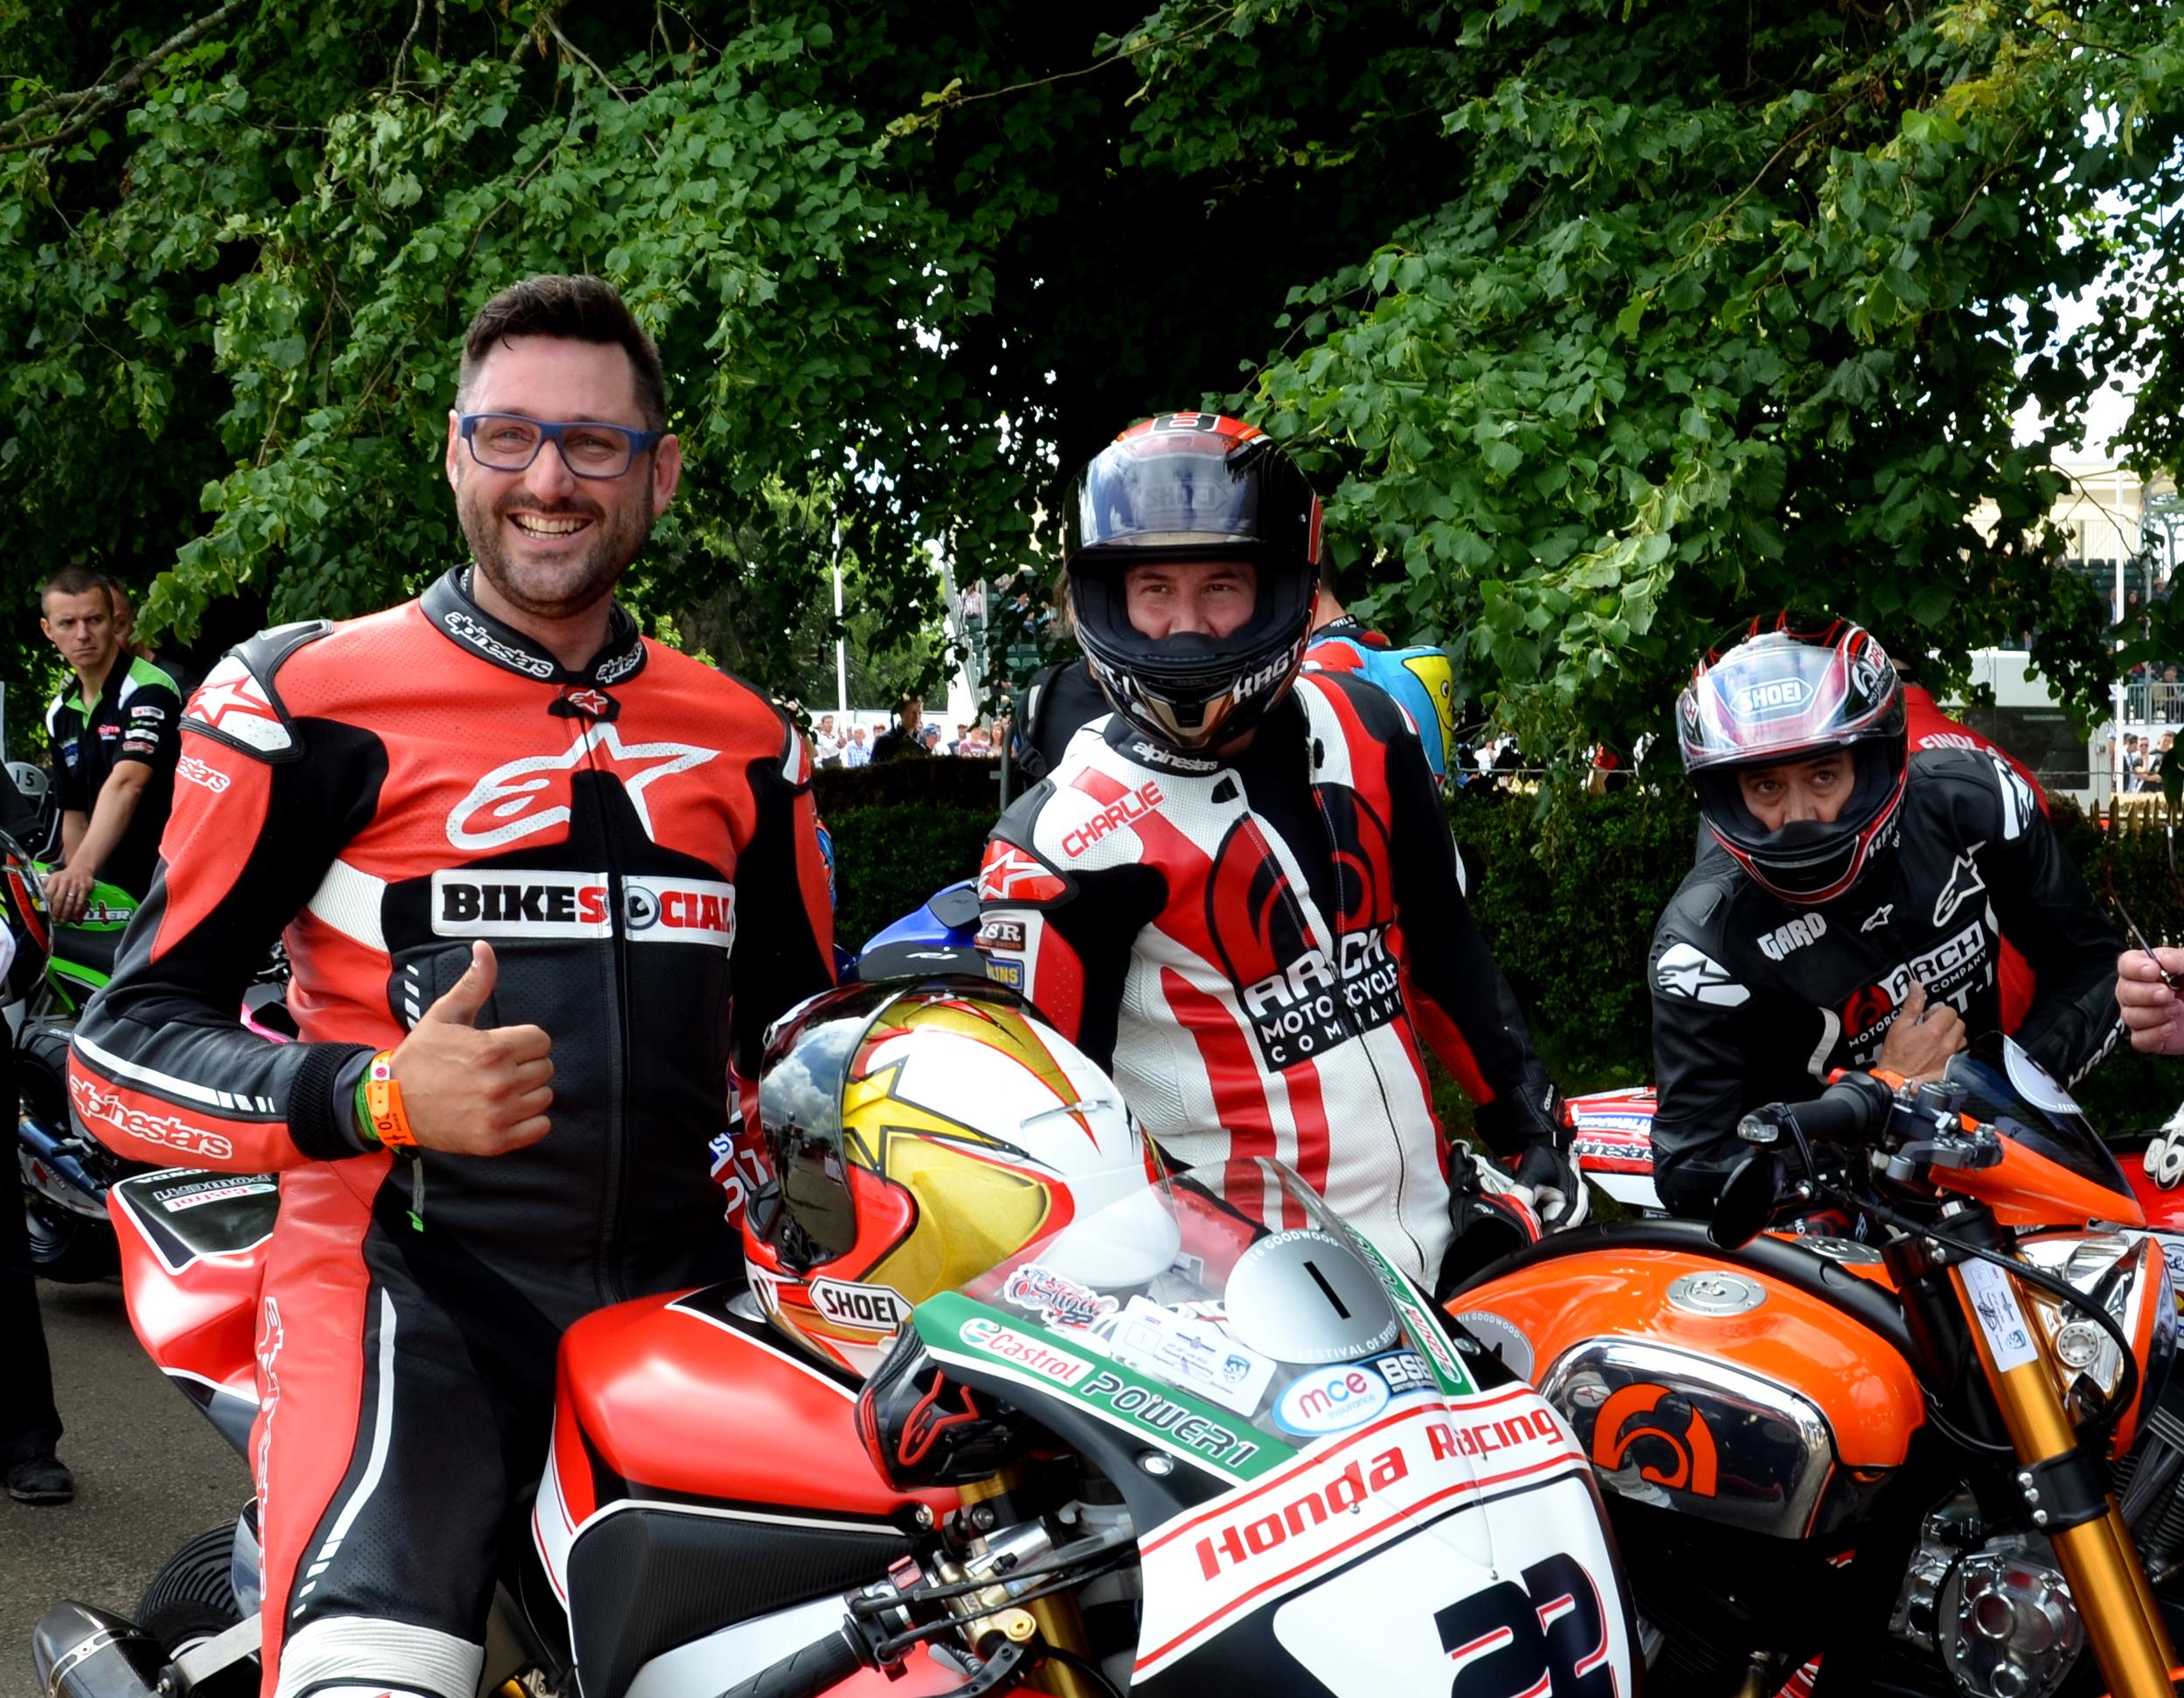 Kearnu Reeves, Gard Hollinger, Arch Motorcycles, Goodwood Festival of Speed